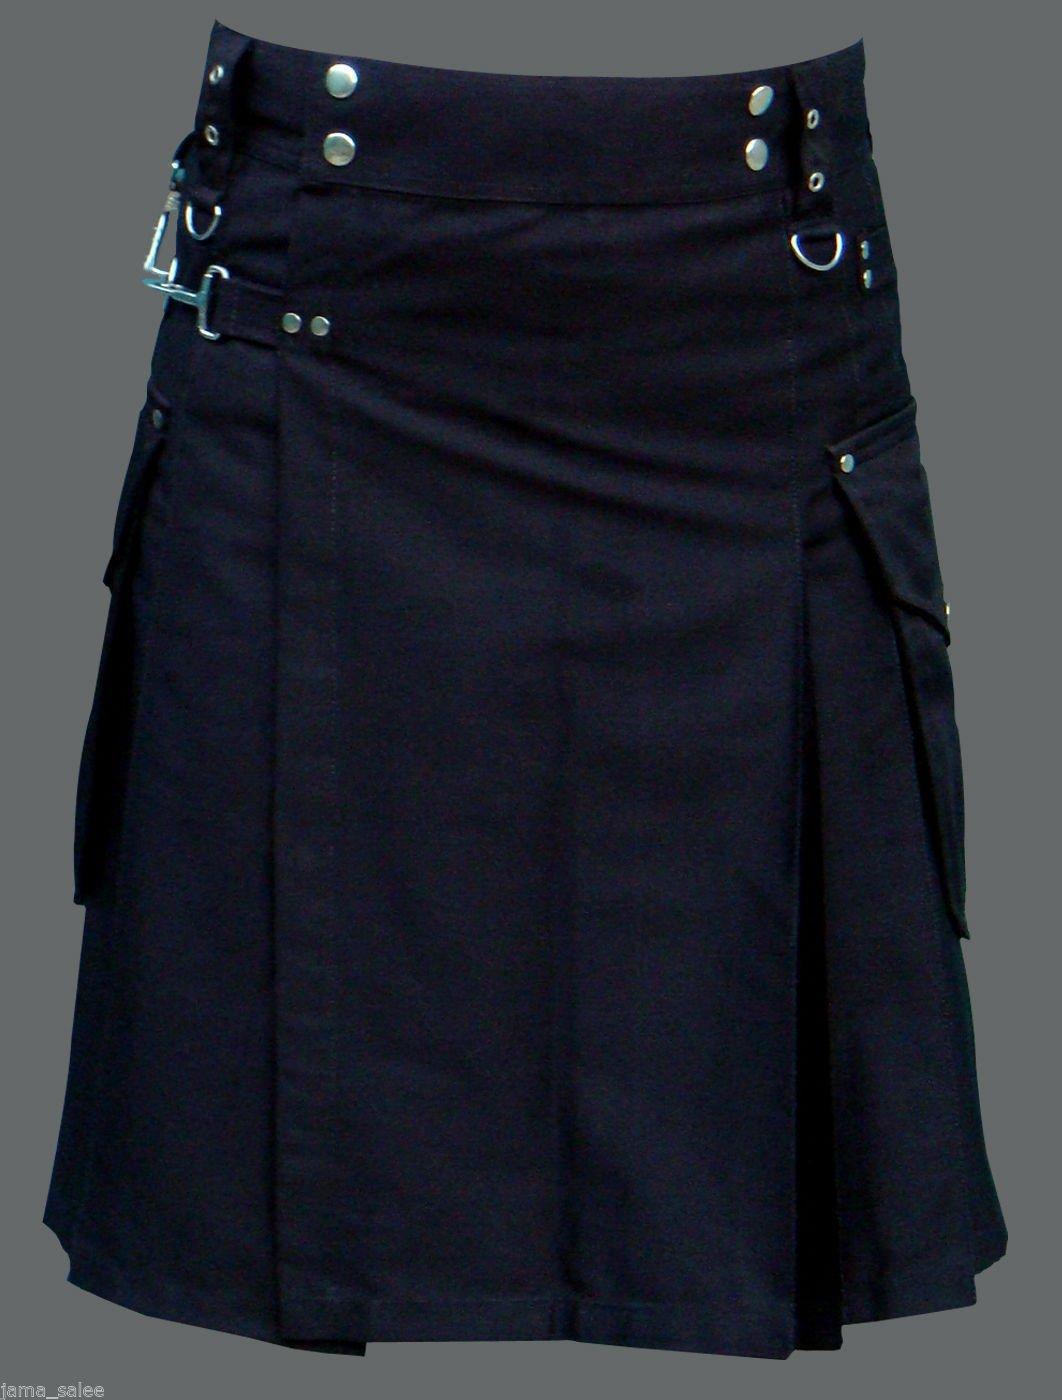 Men 34 Waist Handmade Black Deluxe Utility Kilt 100% Cotton With Cargo Pockets